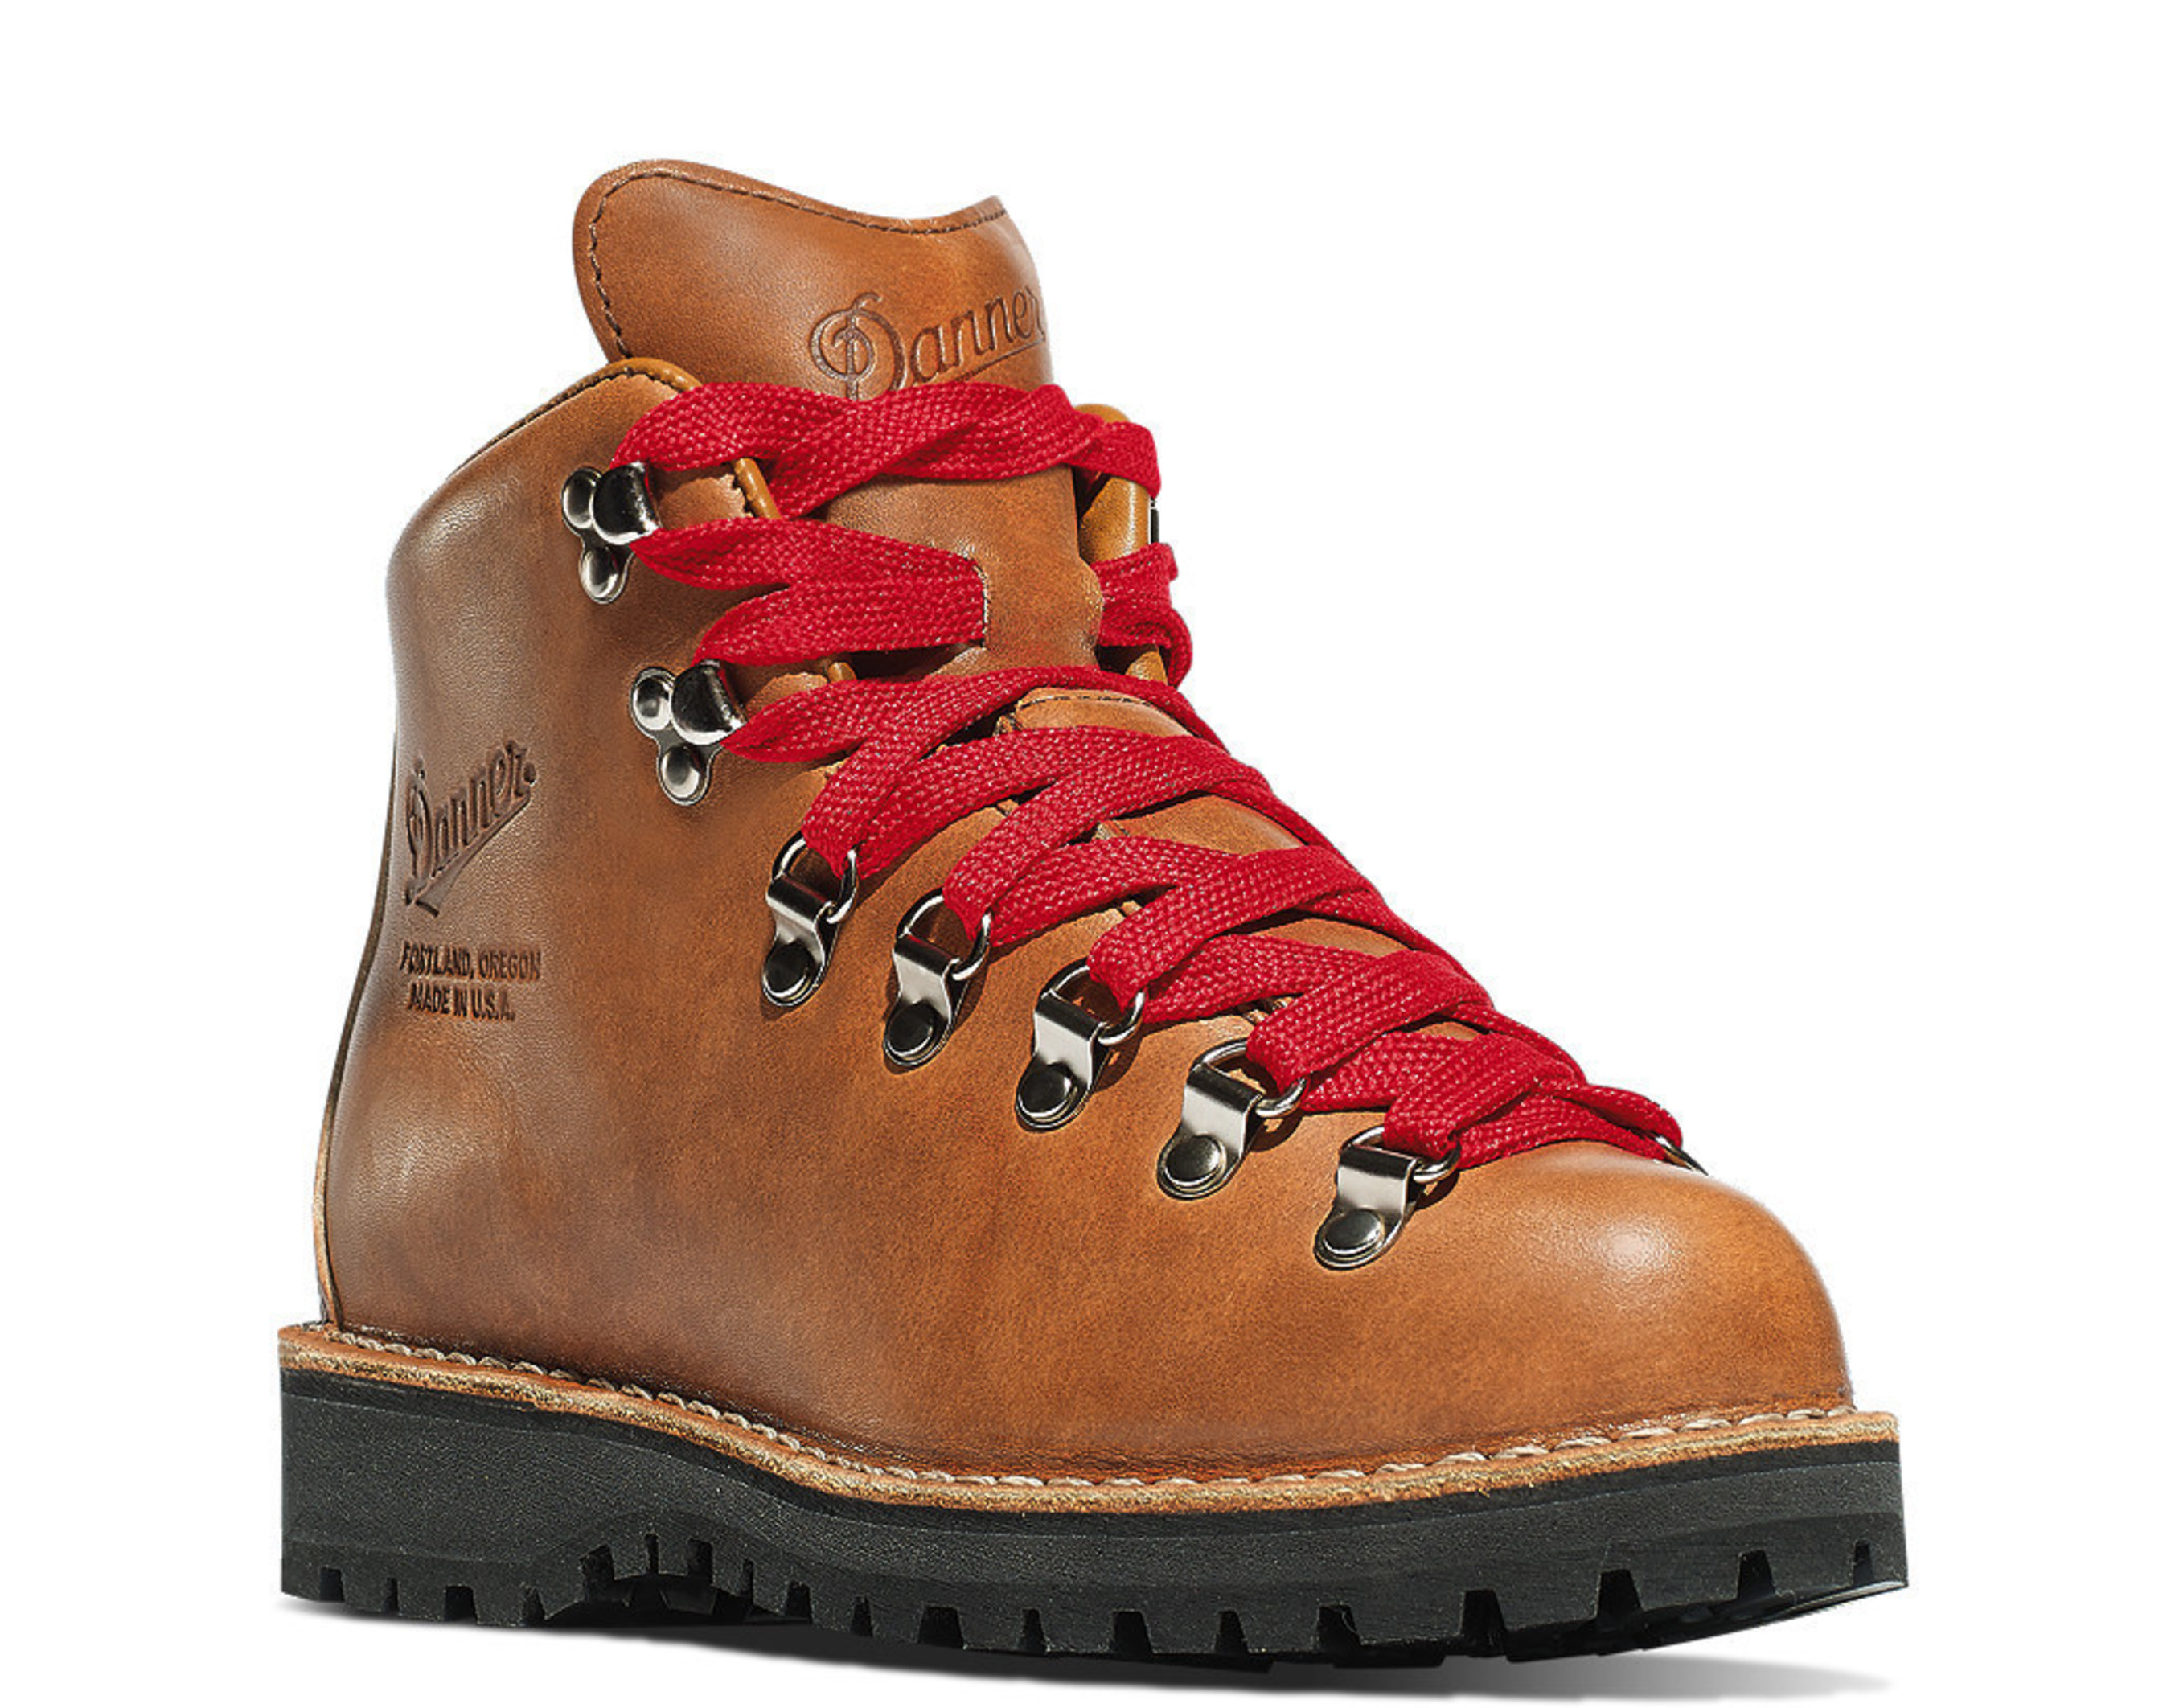 e2981dd27da492 Danner Introduces The Mountain Light Cascade Hiking Boot Featured In ...